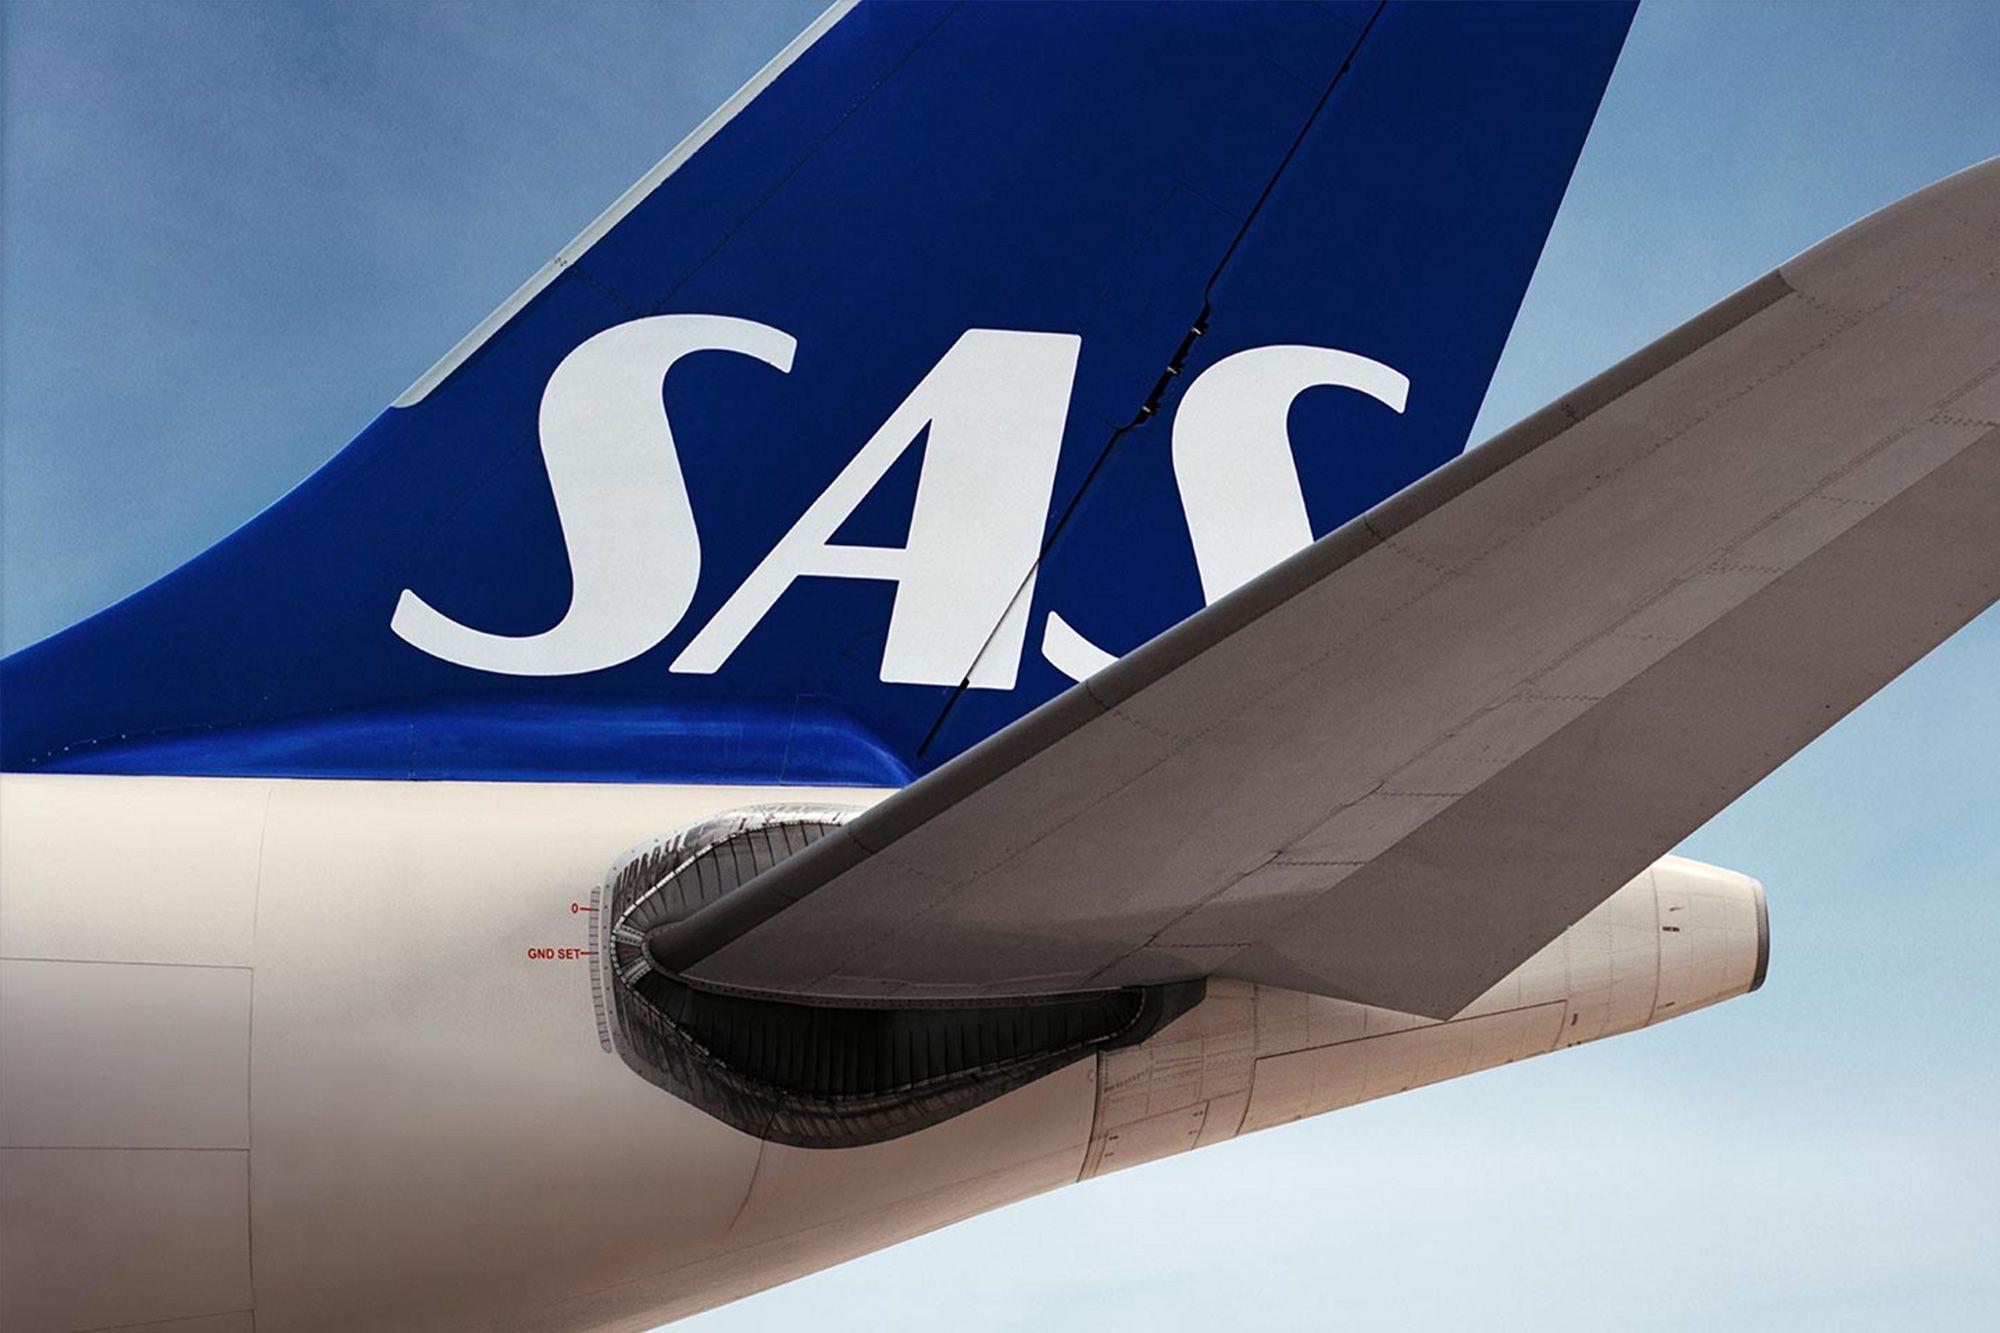 Sas Regains Its Scandinavian Soul And Rises Above Its Rivals Scandinavian Scandinavian Airlines System Scandinavian Dressing Tables